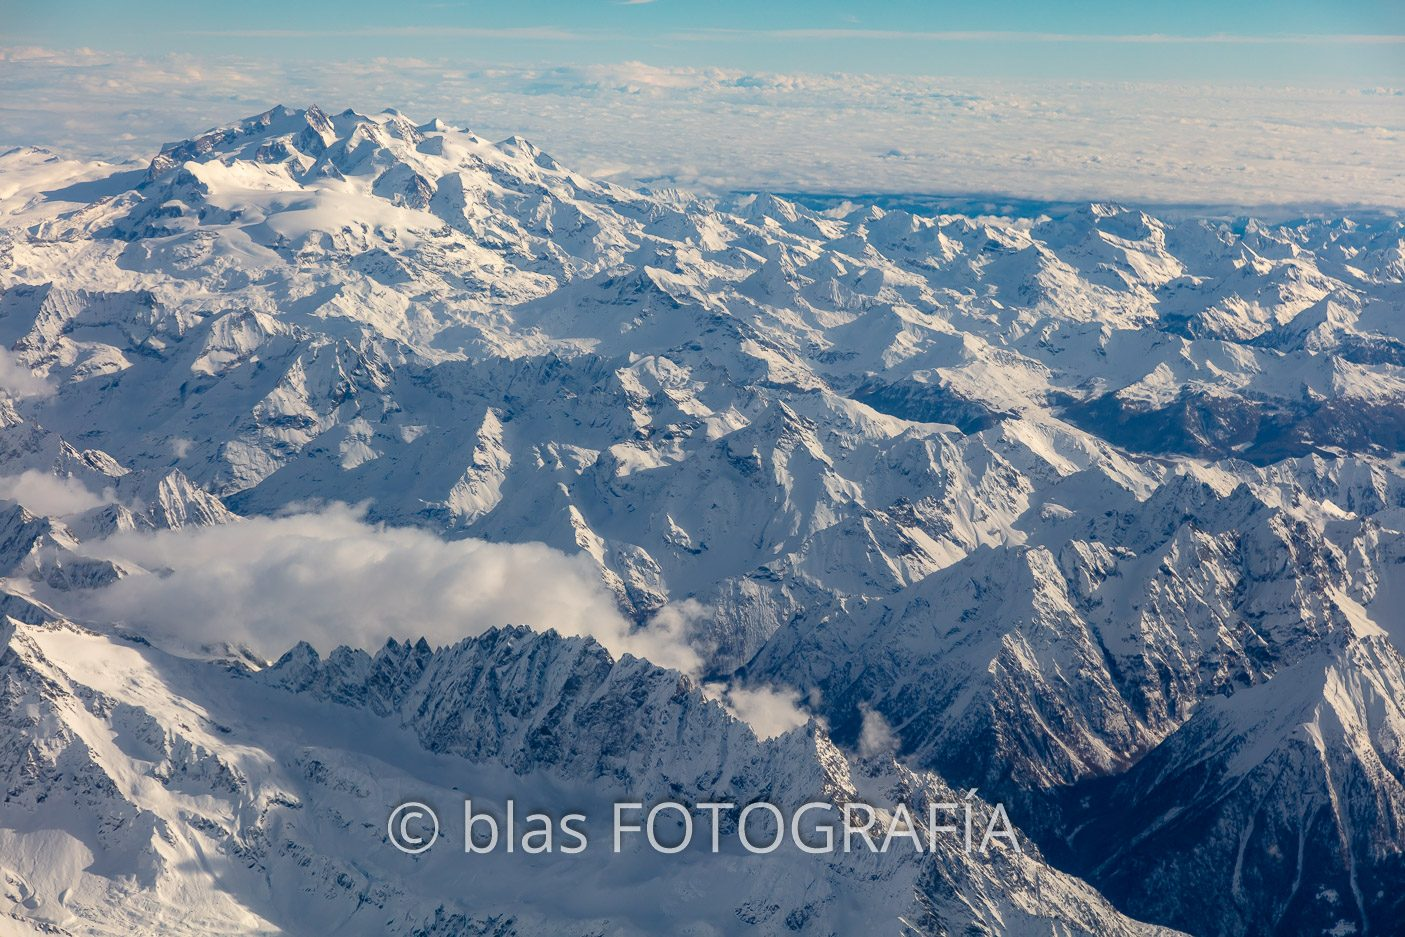 Mont Blanc desde el aire